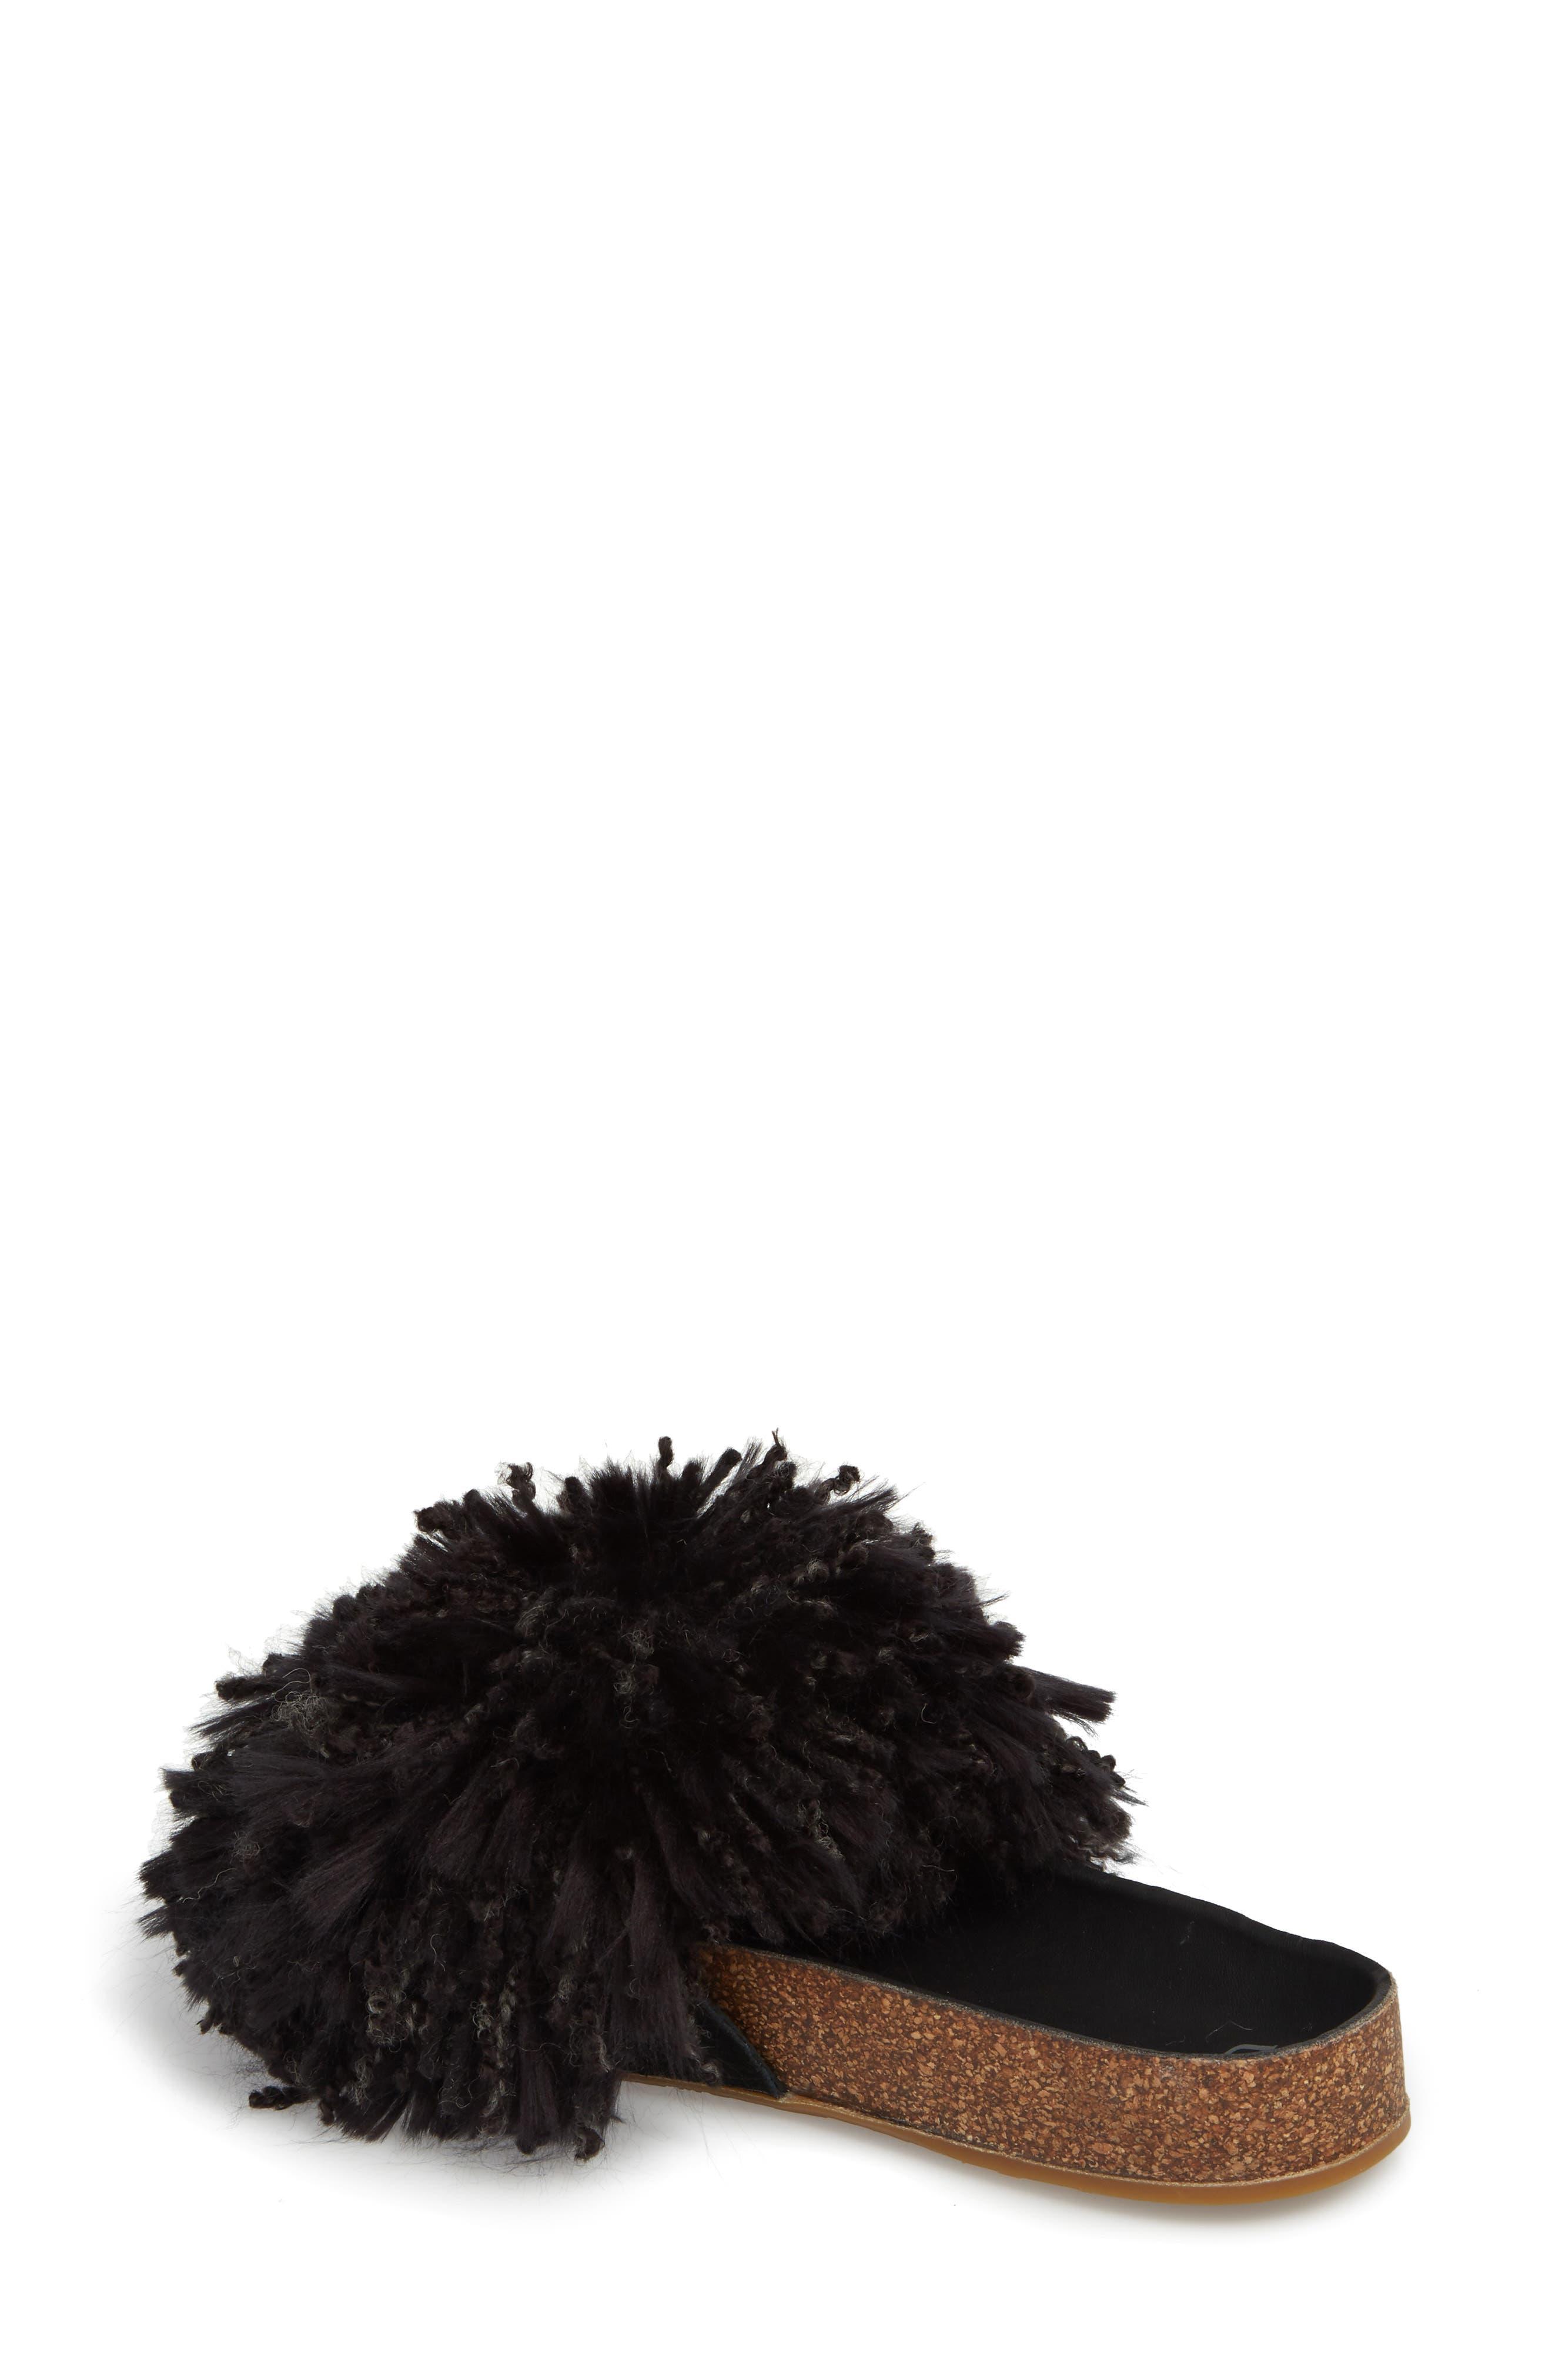 Cindi Yarn Pom Sandal,                             Alternate thumbnail 2, color,                             BLACK